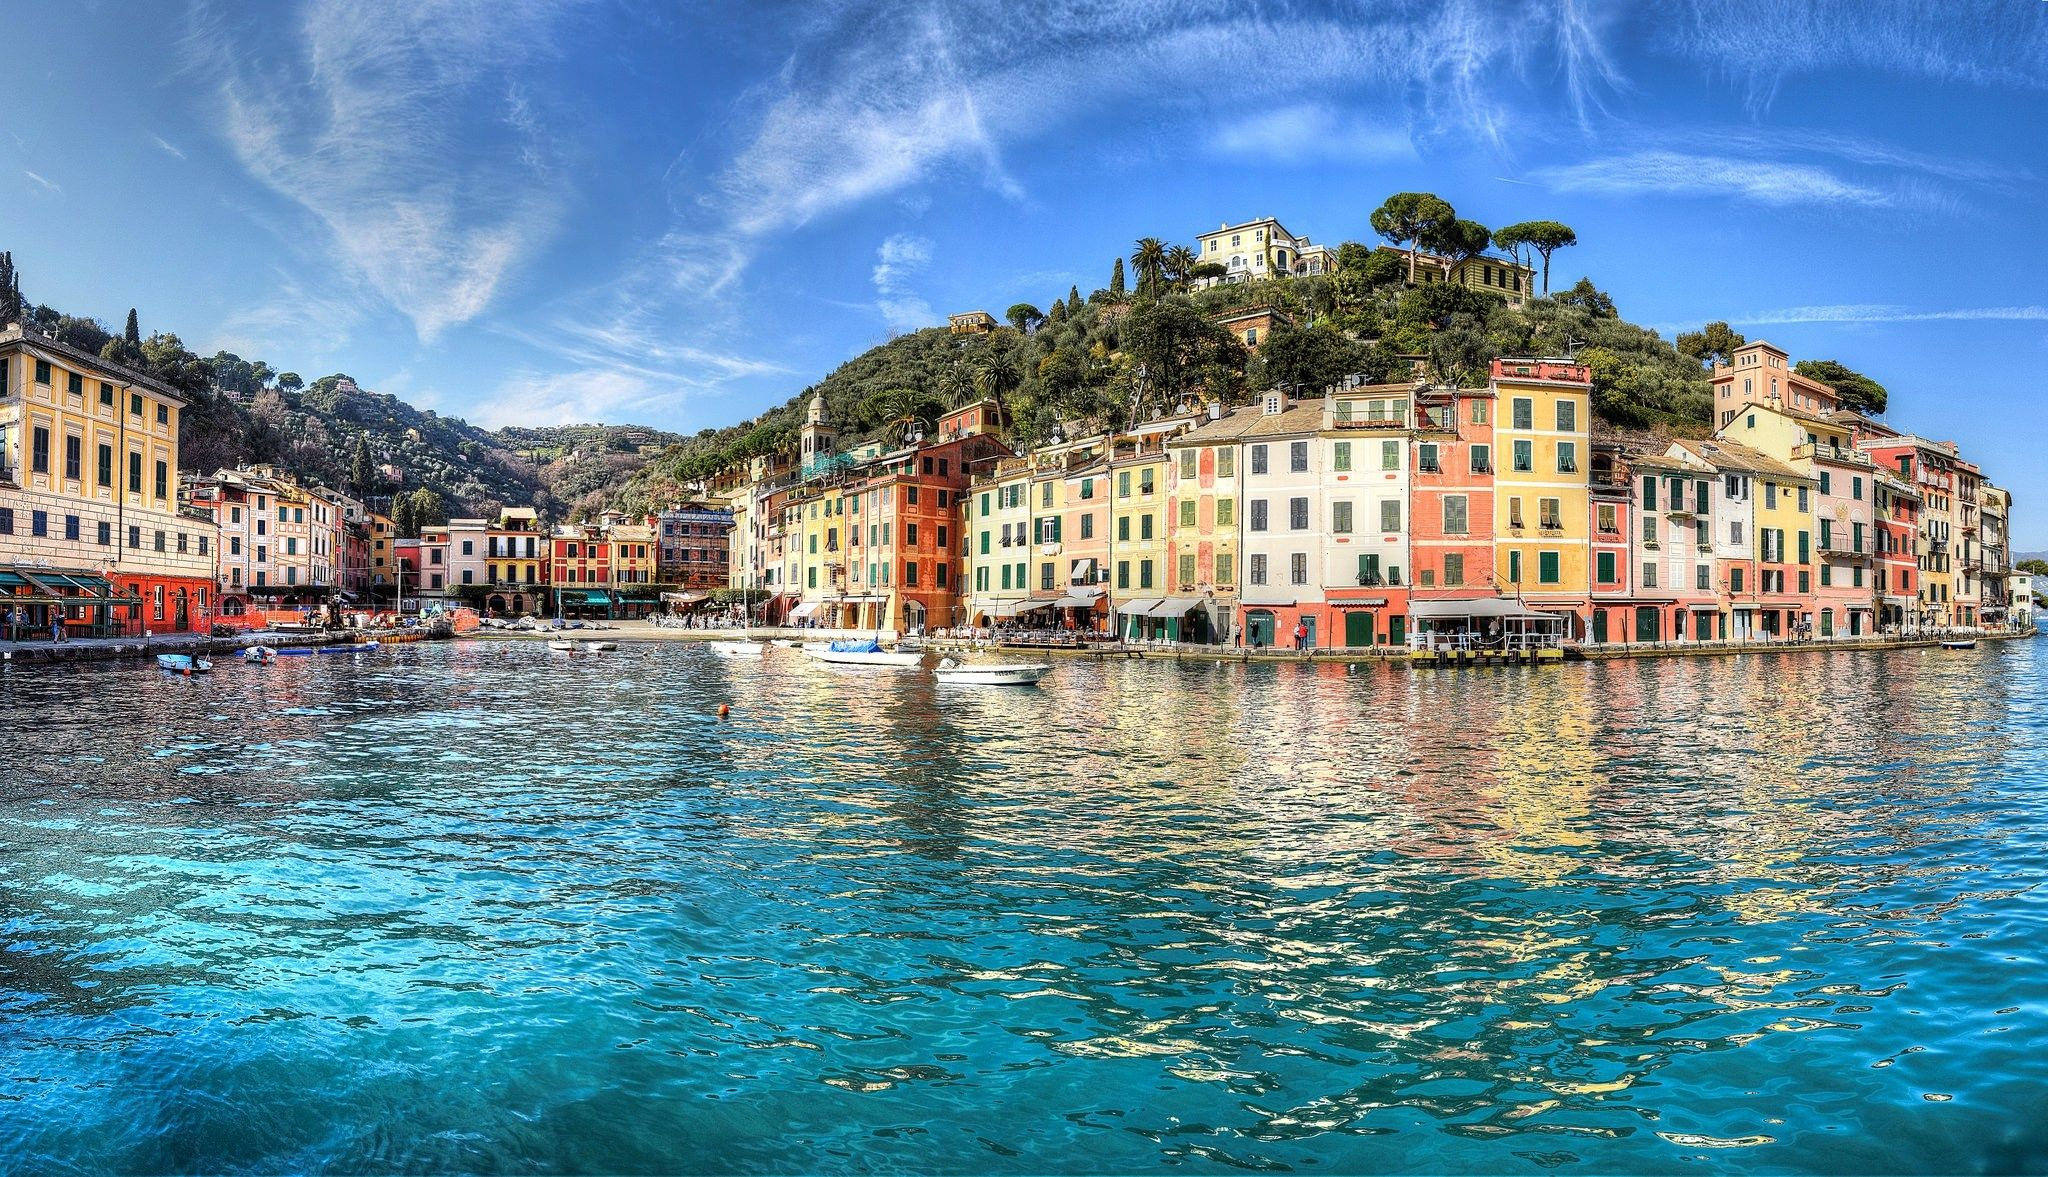 Desktop Wallpaper For Portofino Portofino Italy Portofino Luxury Travel